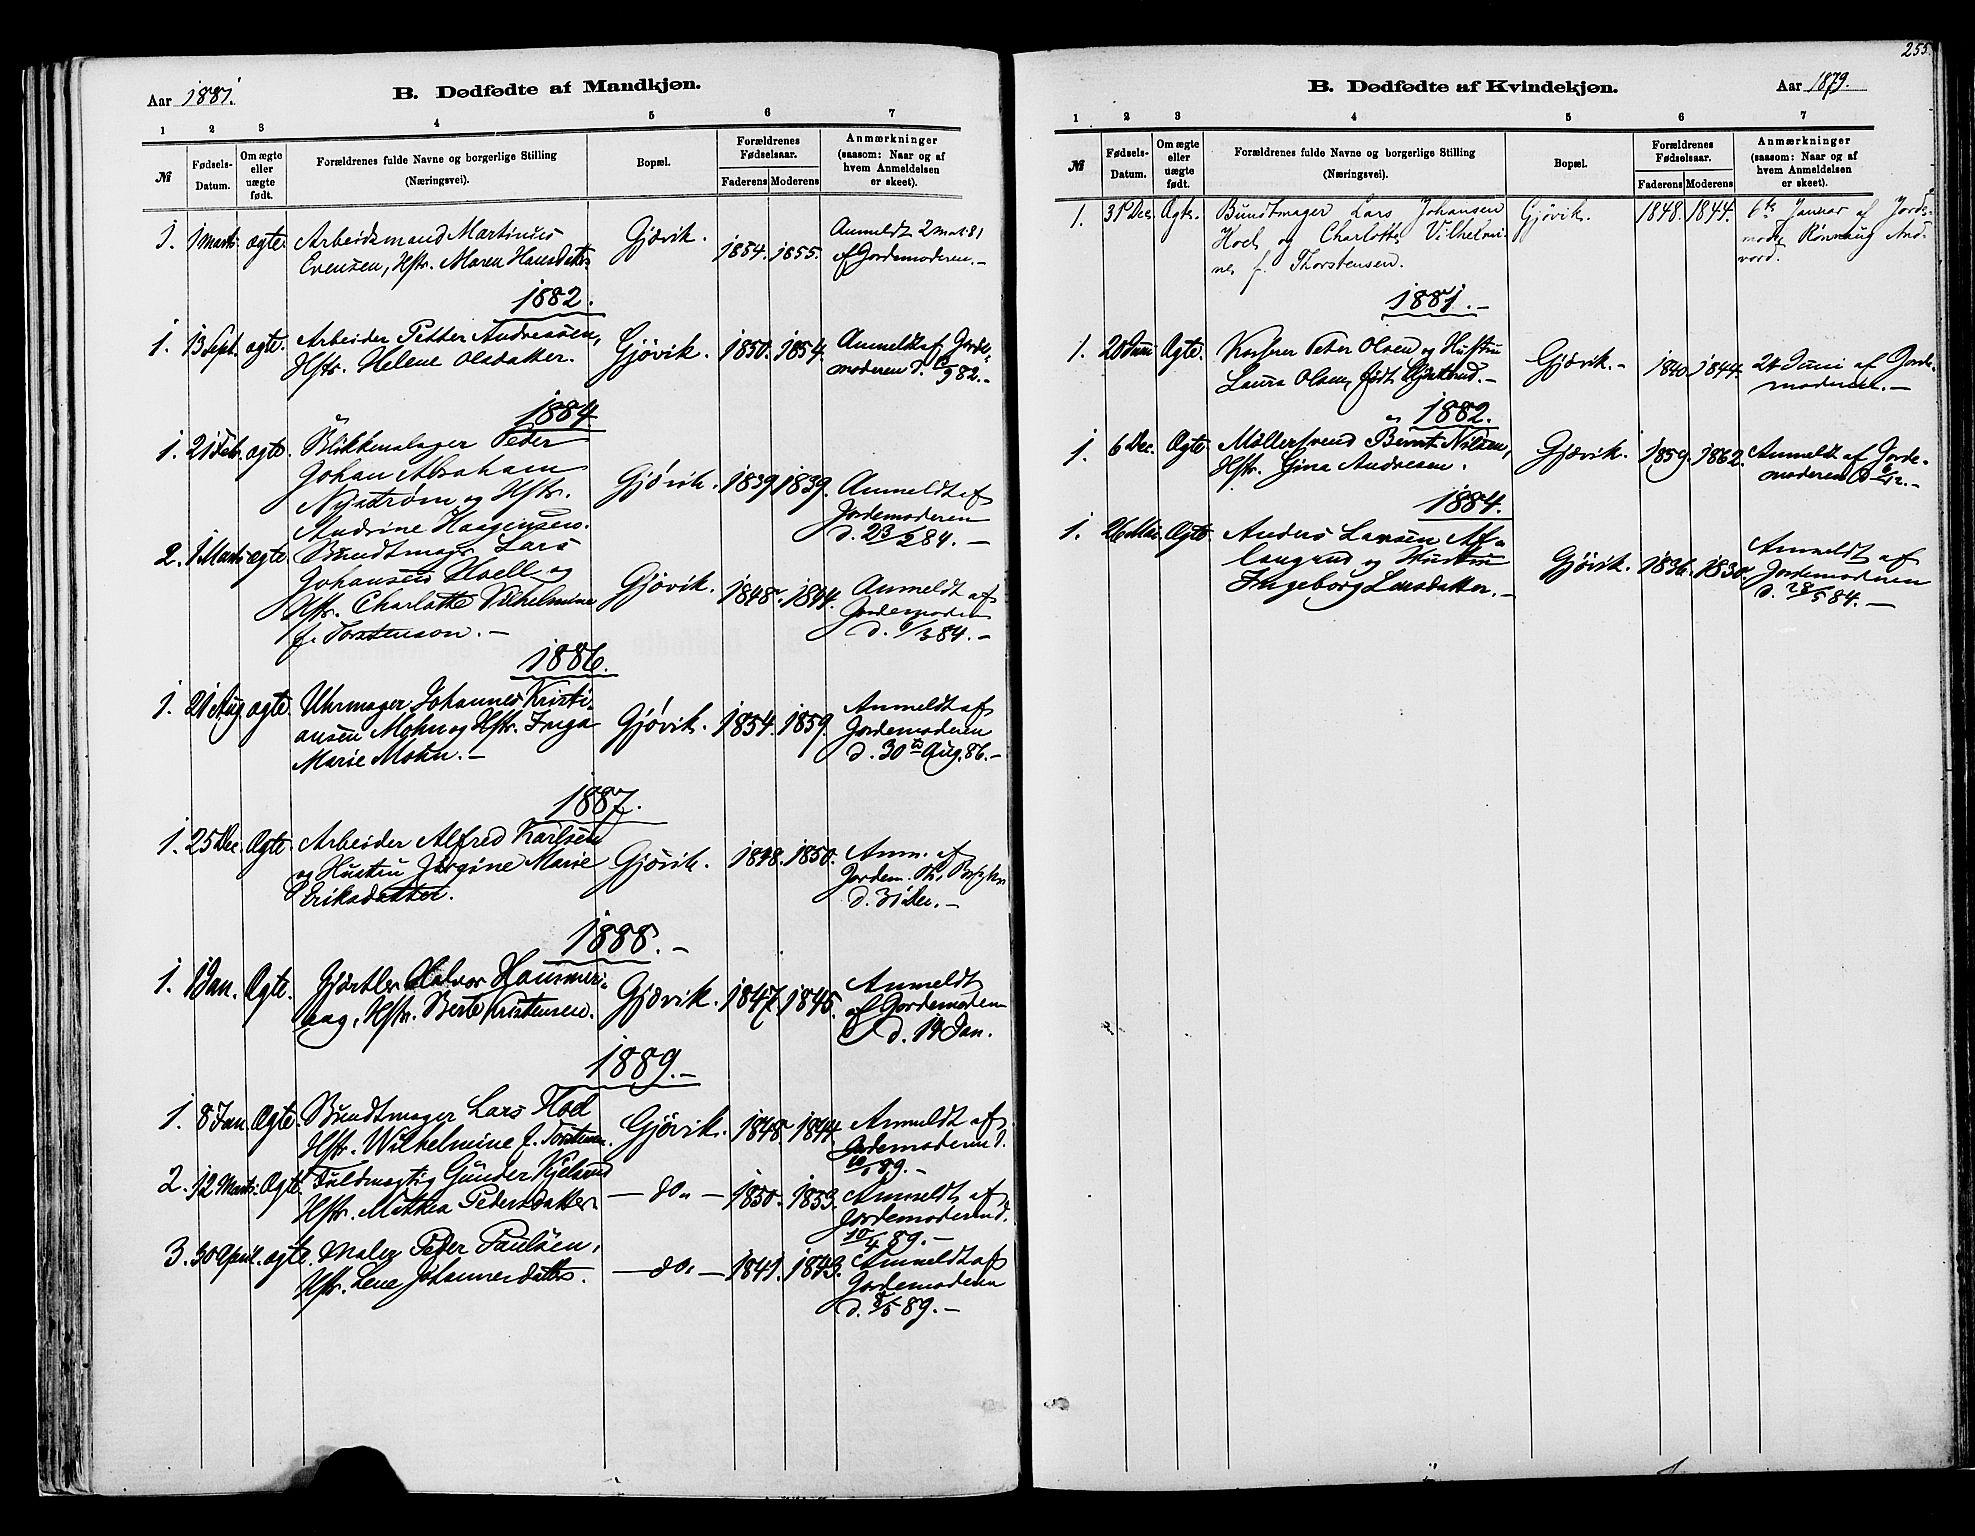 SAH, Vardal prestekontor, H/Ha/Haa/L0008: Ministerialbok nr. 8, 1878-1890, s. 255